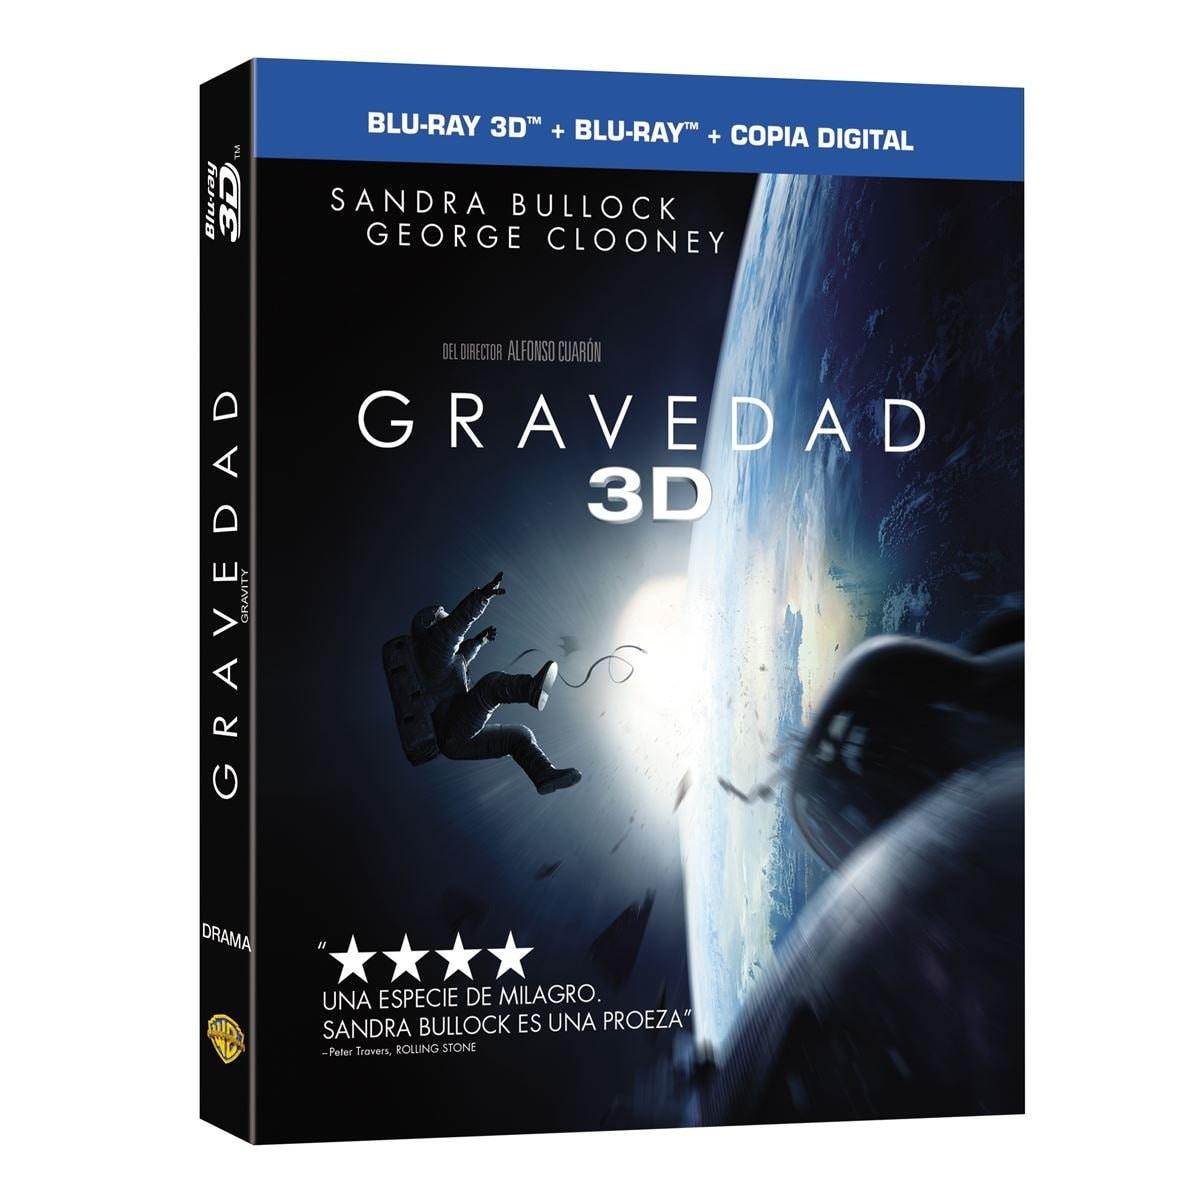 3D + Blu Ray + Dc Gravedad